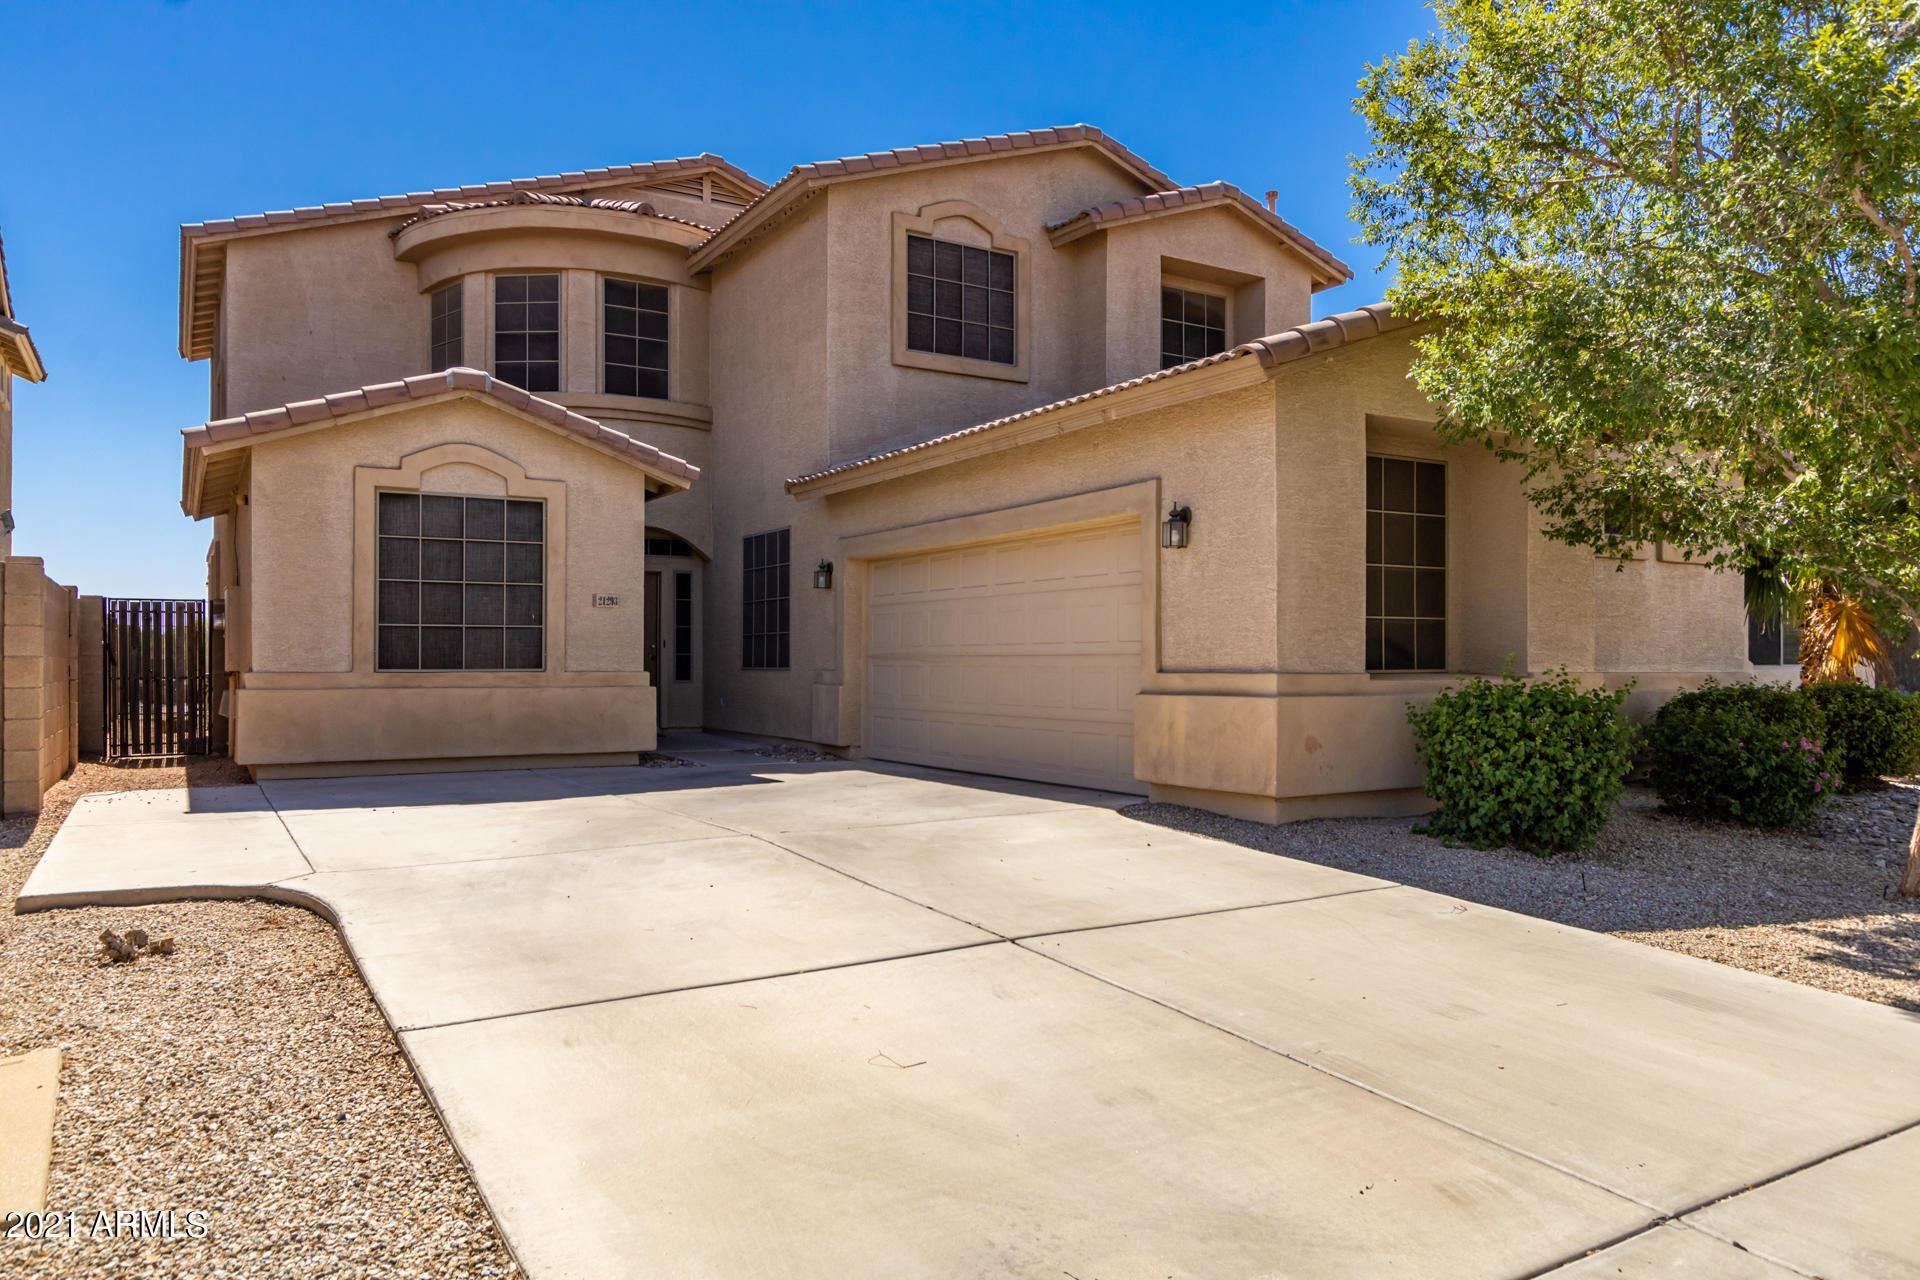 Photo for 21293 N SALLY Drive, Maricopa, AZ 85138 (MLS # 6257860)